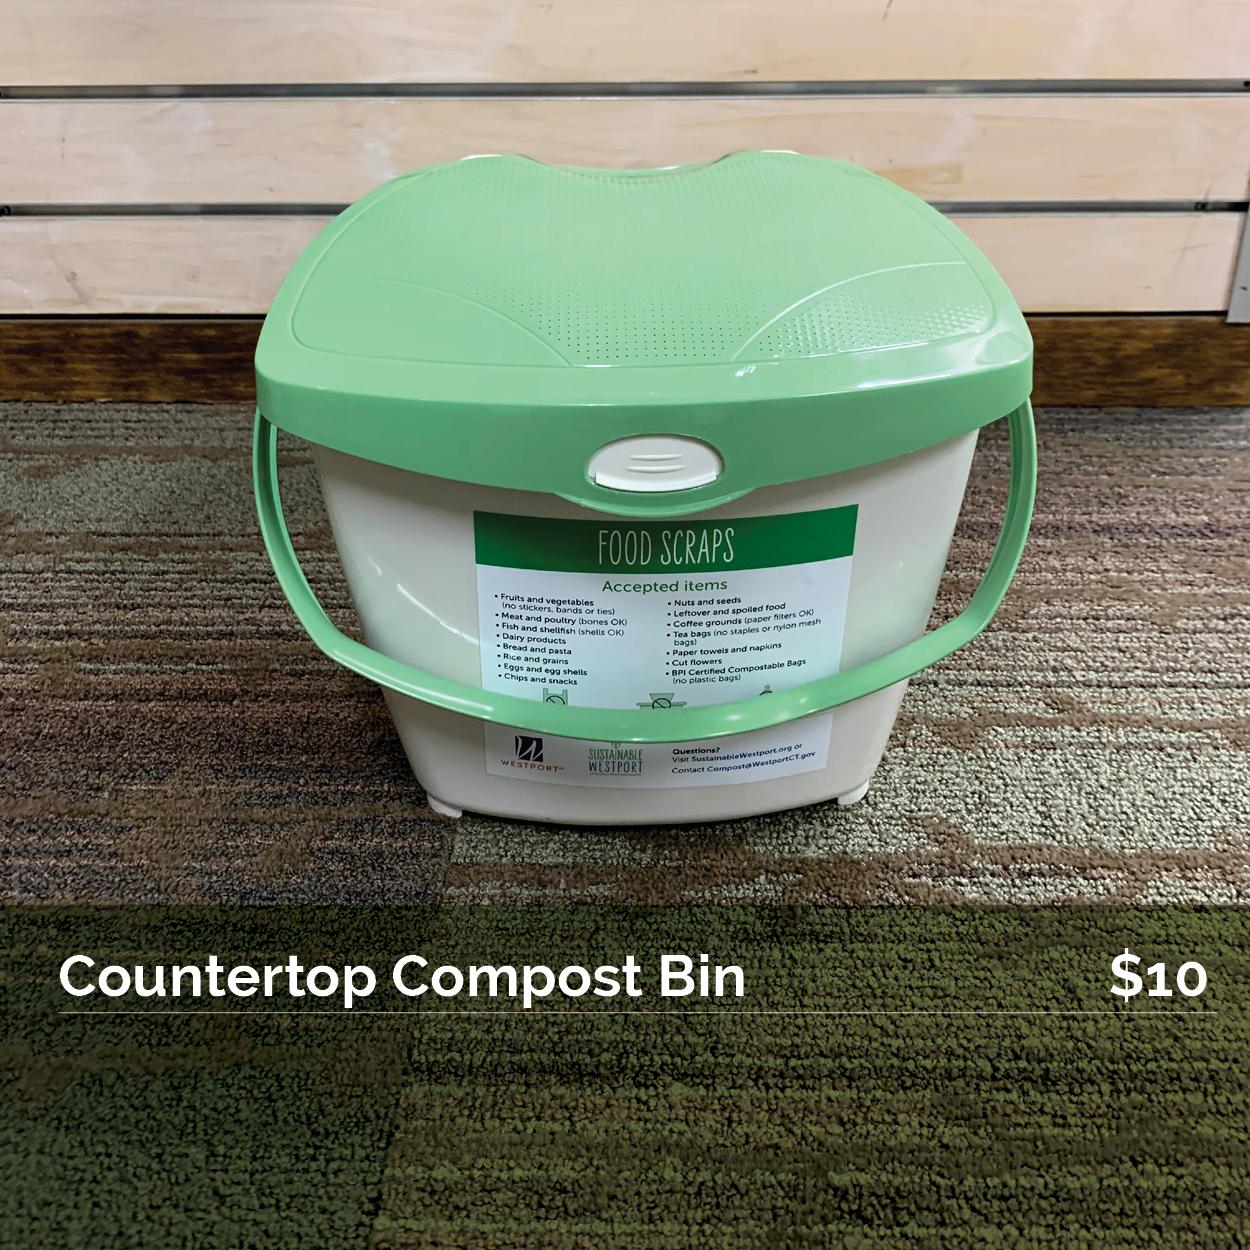 Countertop Compost Bin